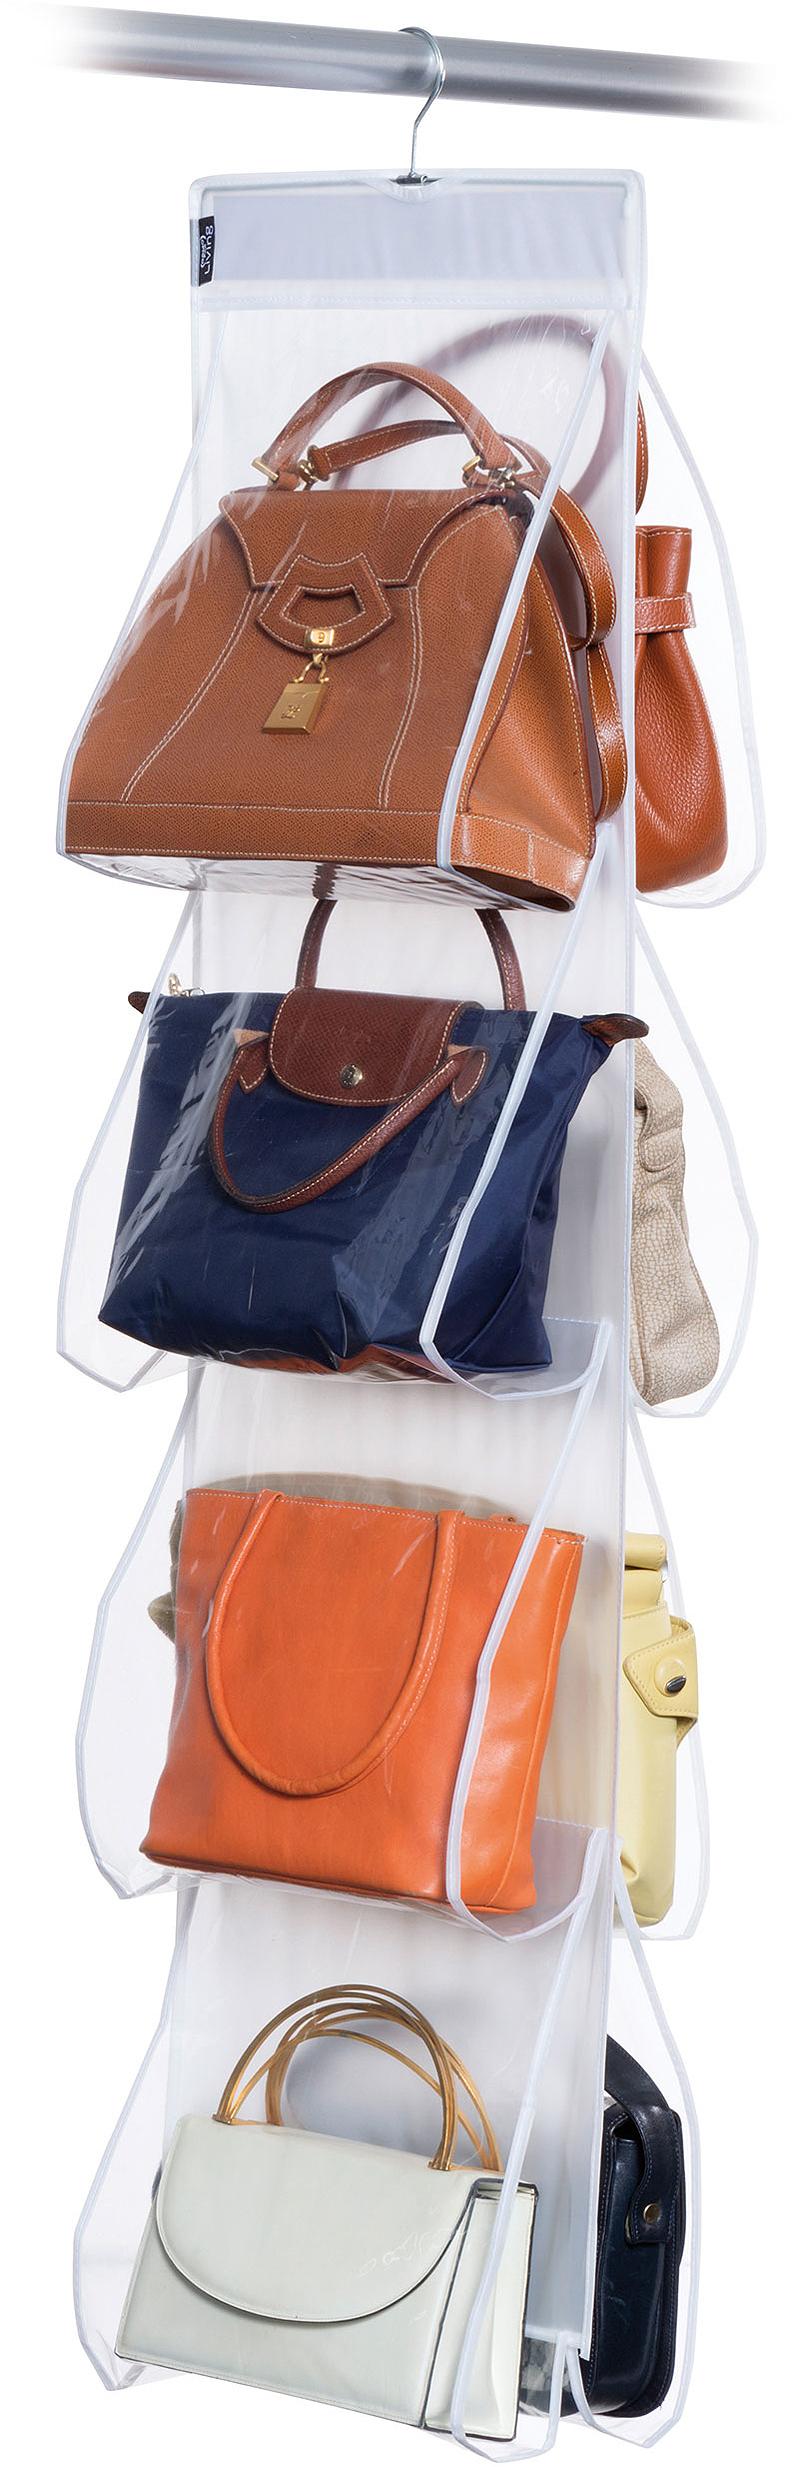 DOMOPAK Living Závěsný organizér na kabelky s 8 kapsami